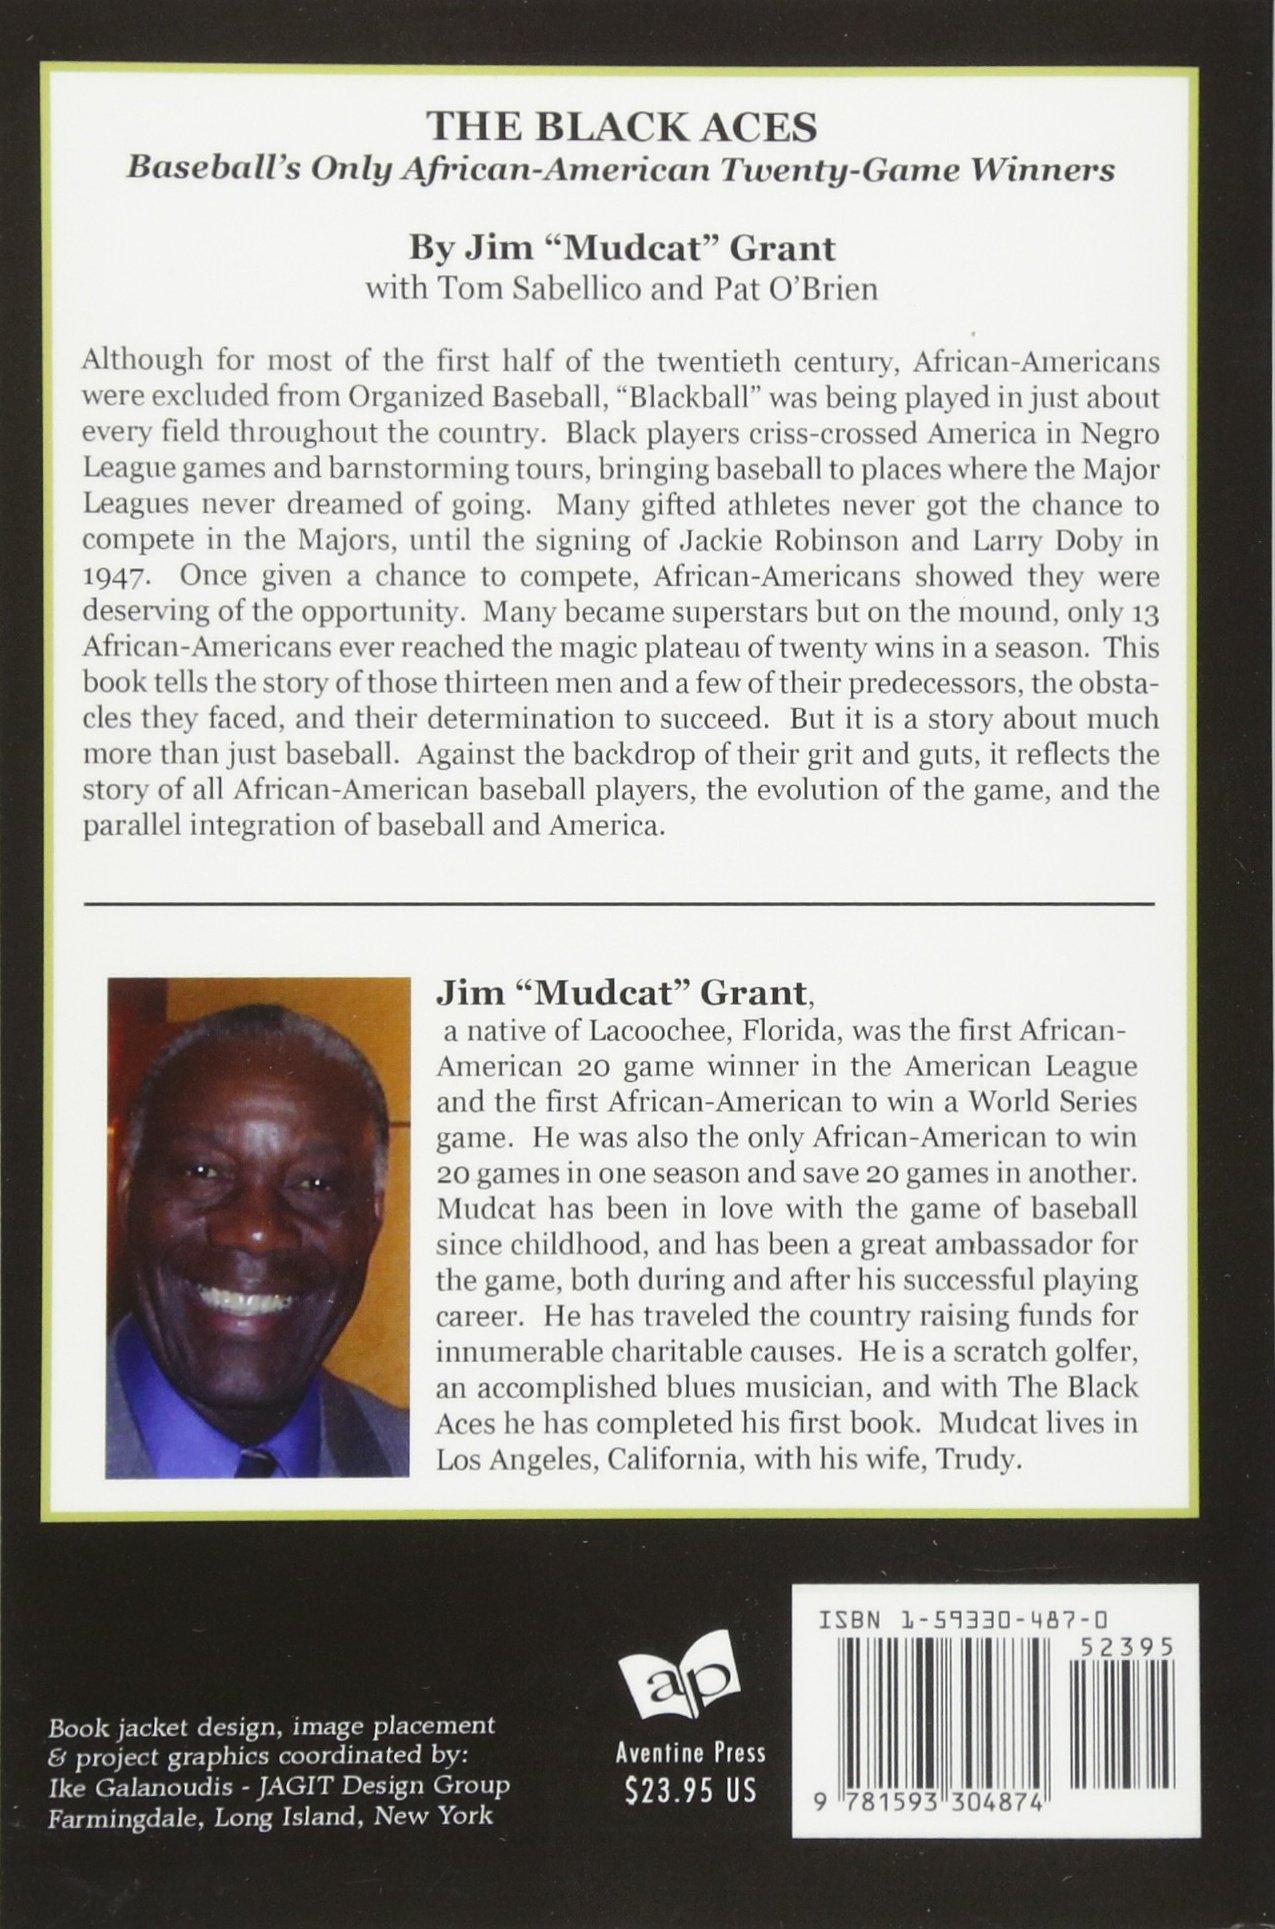 Designer deals club for hancock - The Black Aces Baseball S Only African American Twenty Game Winners Jim Mudcat Grant Tom Sabellico Pat O Brien 9781593304874 Amazon Com Books